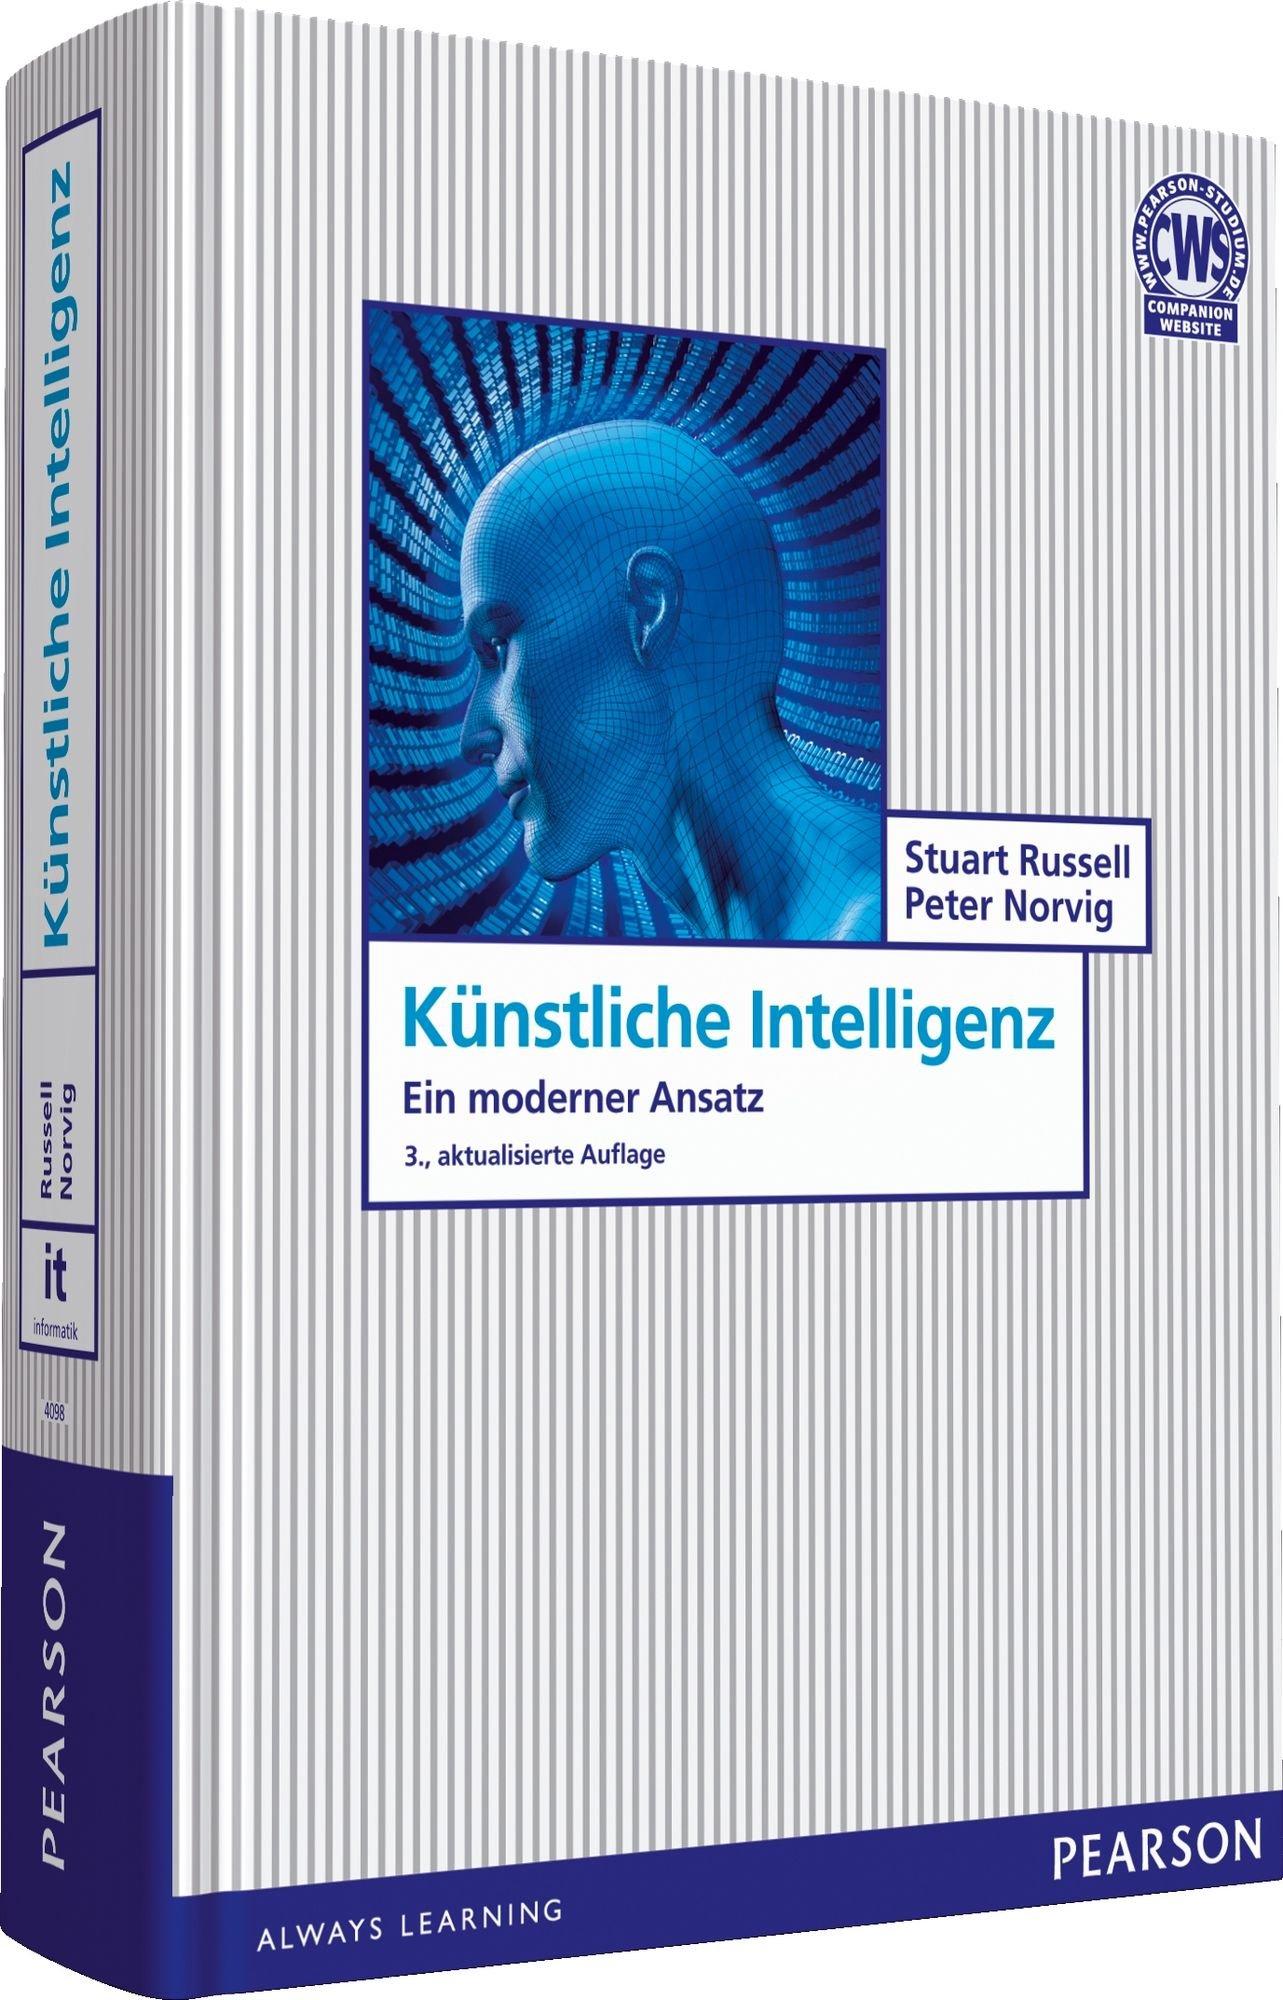 Künstliche Intelligenz (Pearson Studium - IT): Amazon.de: Stuart ...